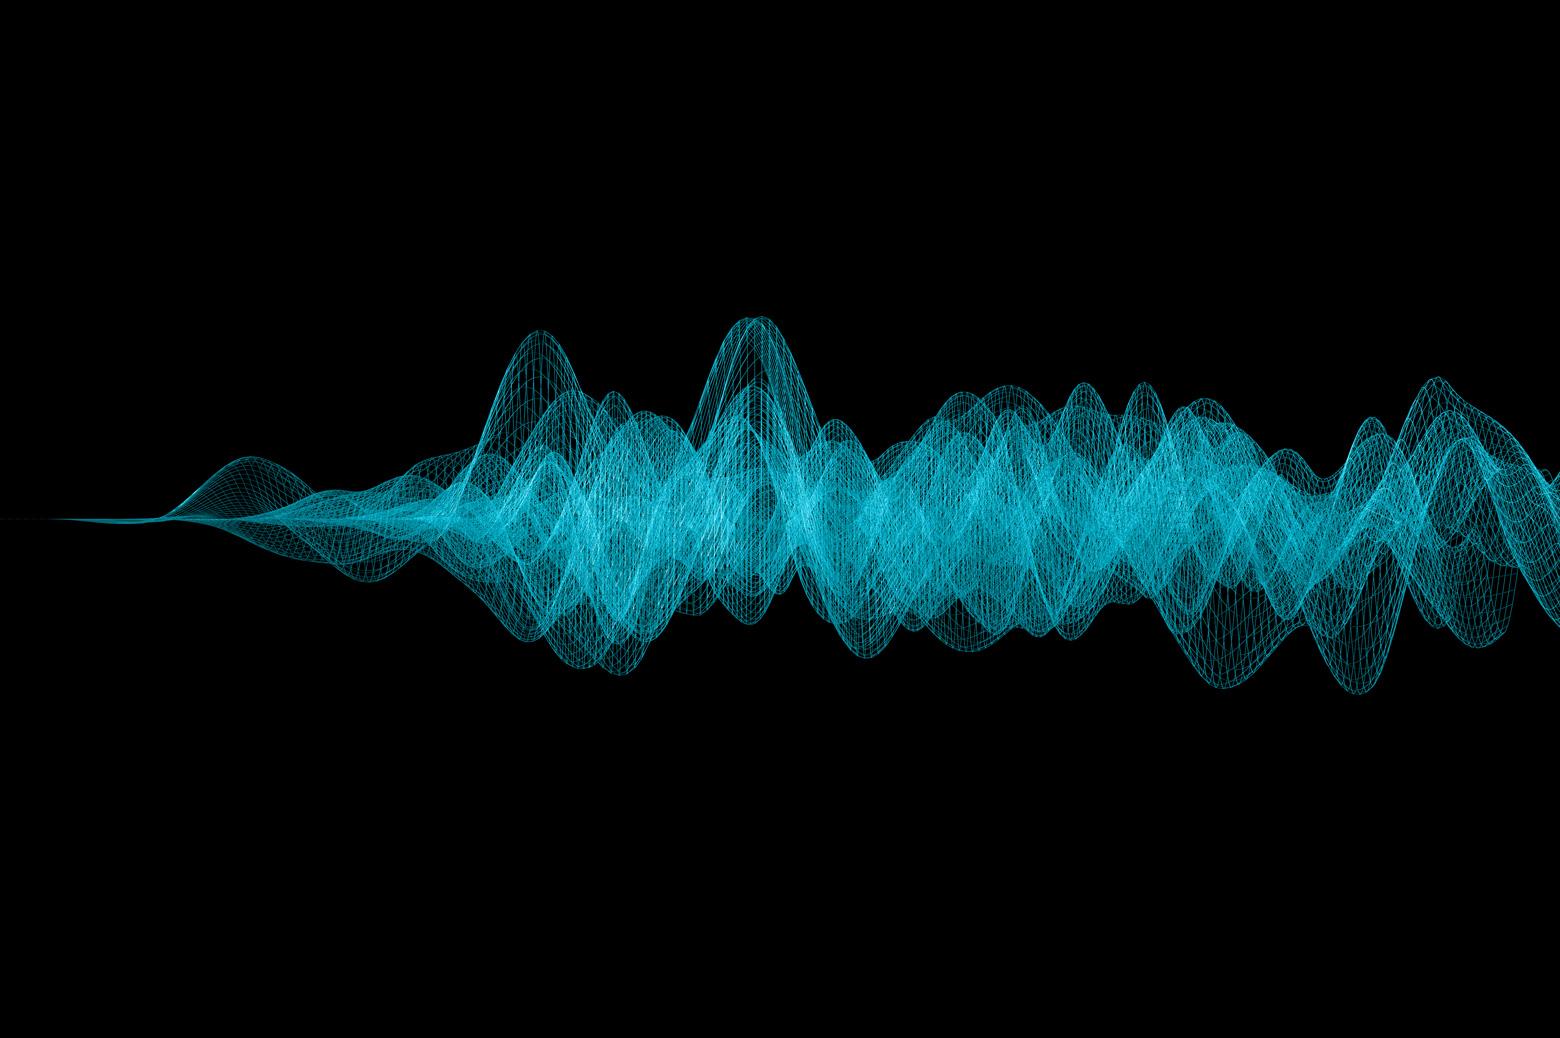 Revealing hidden information in sound waves | University of Michigan